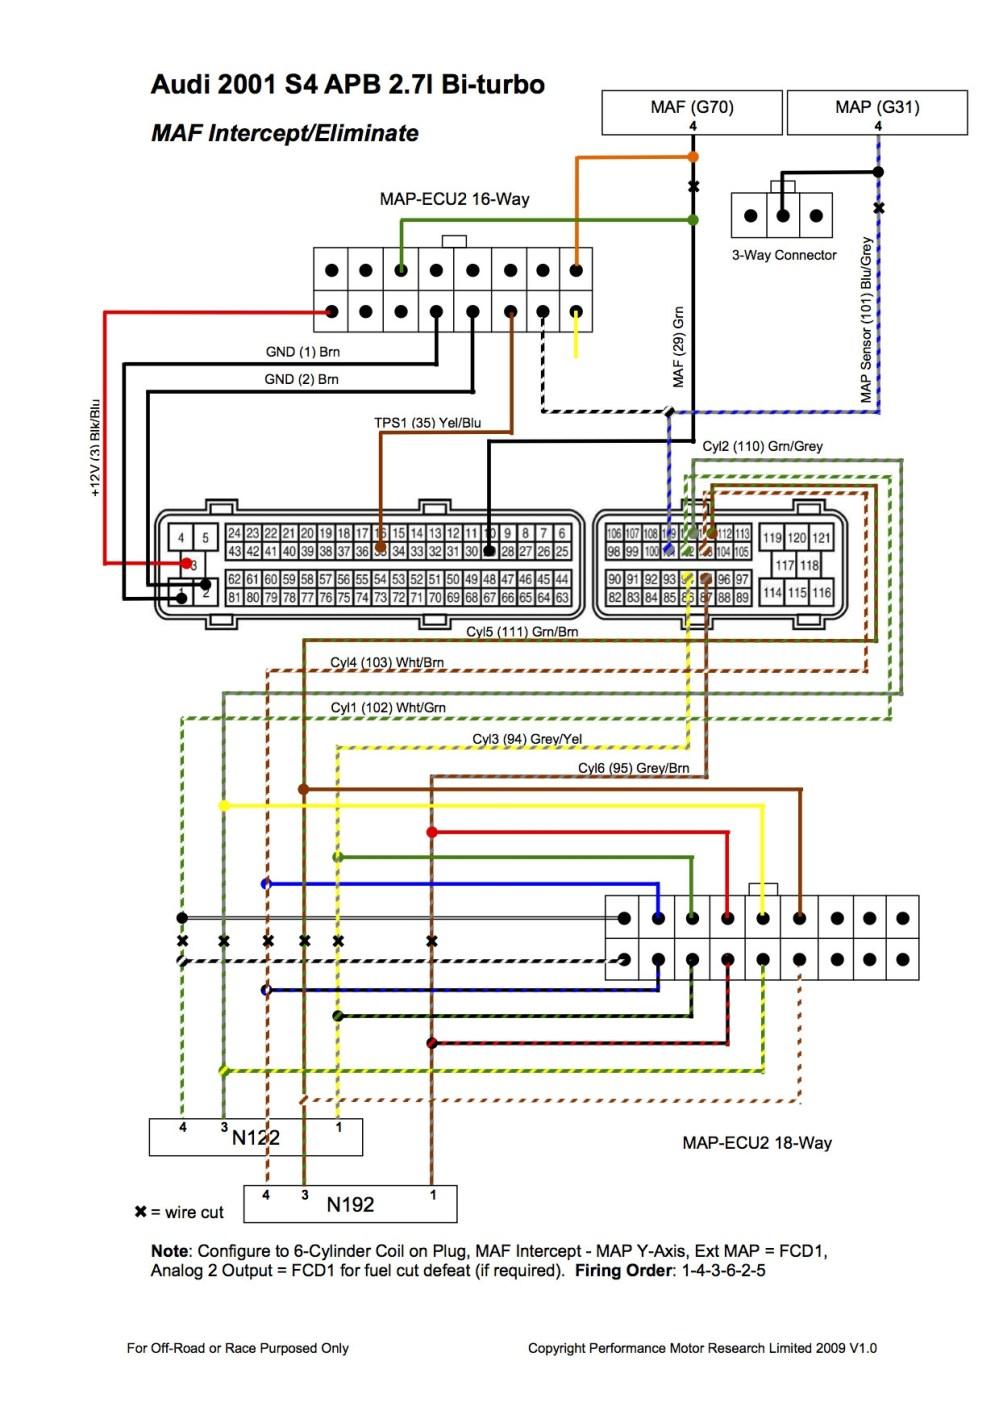 medium resolution of toyota ln130 wiring diagram wiring diagramtoyota ecm wiring diagram control cables u0026 wiring diagramwiring